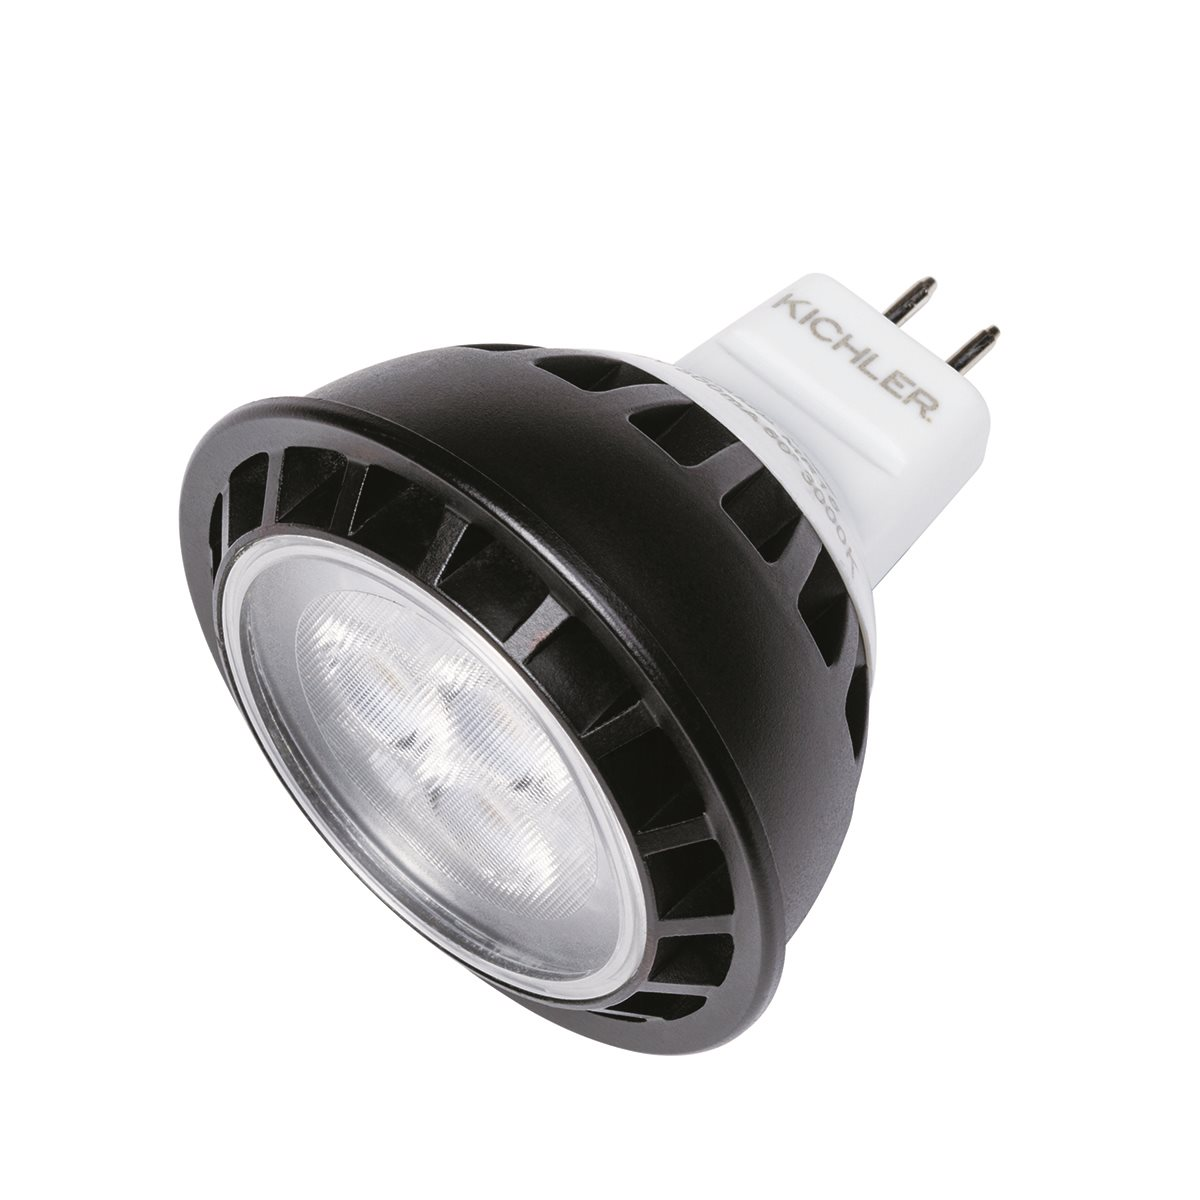 Kichler Lighting Utilitarian Landscape 12V LED Lamp - 18131